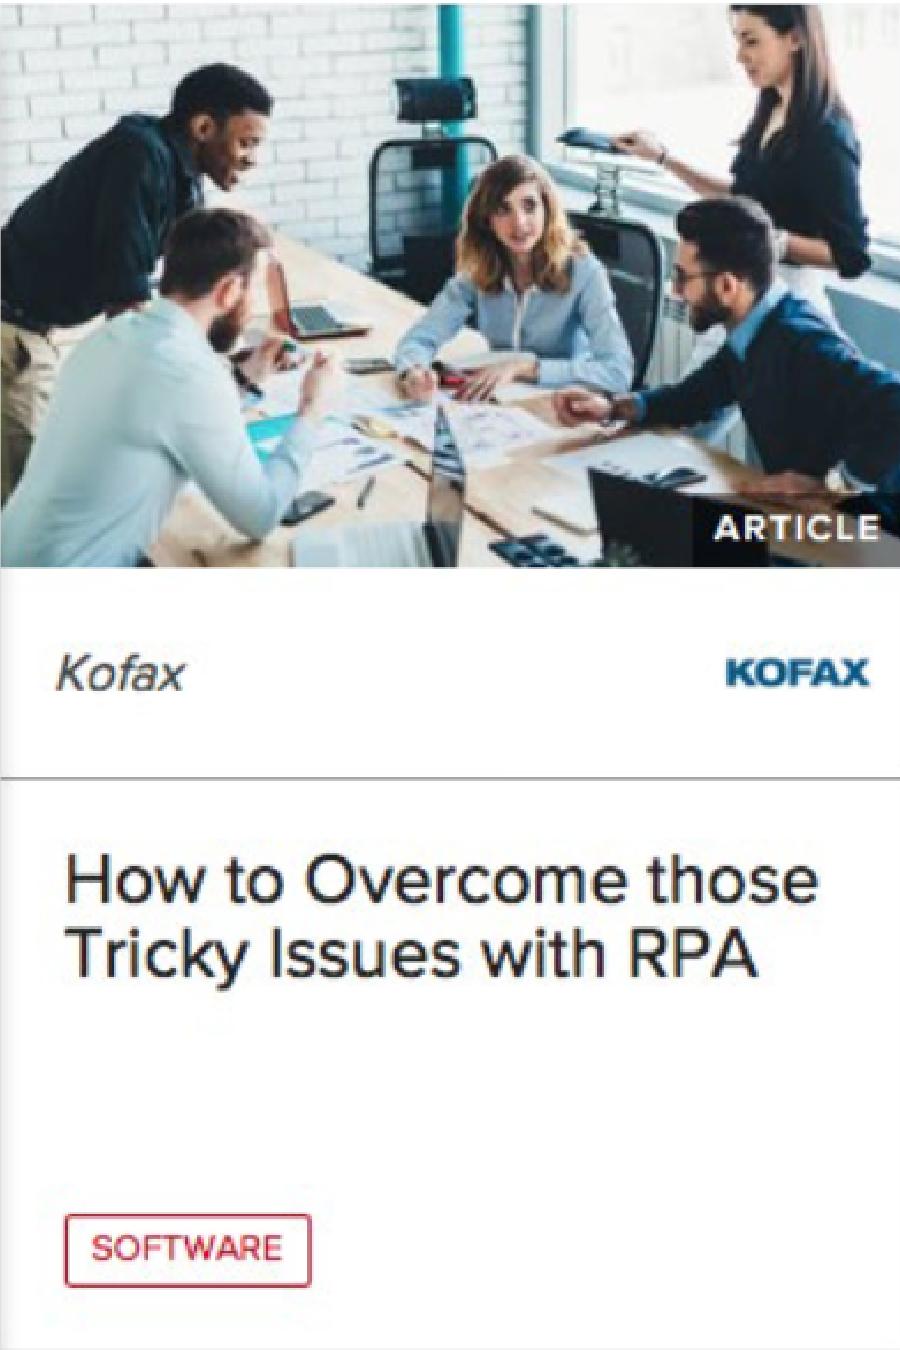 Kofax IFP